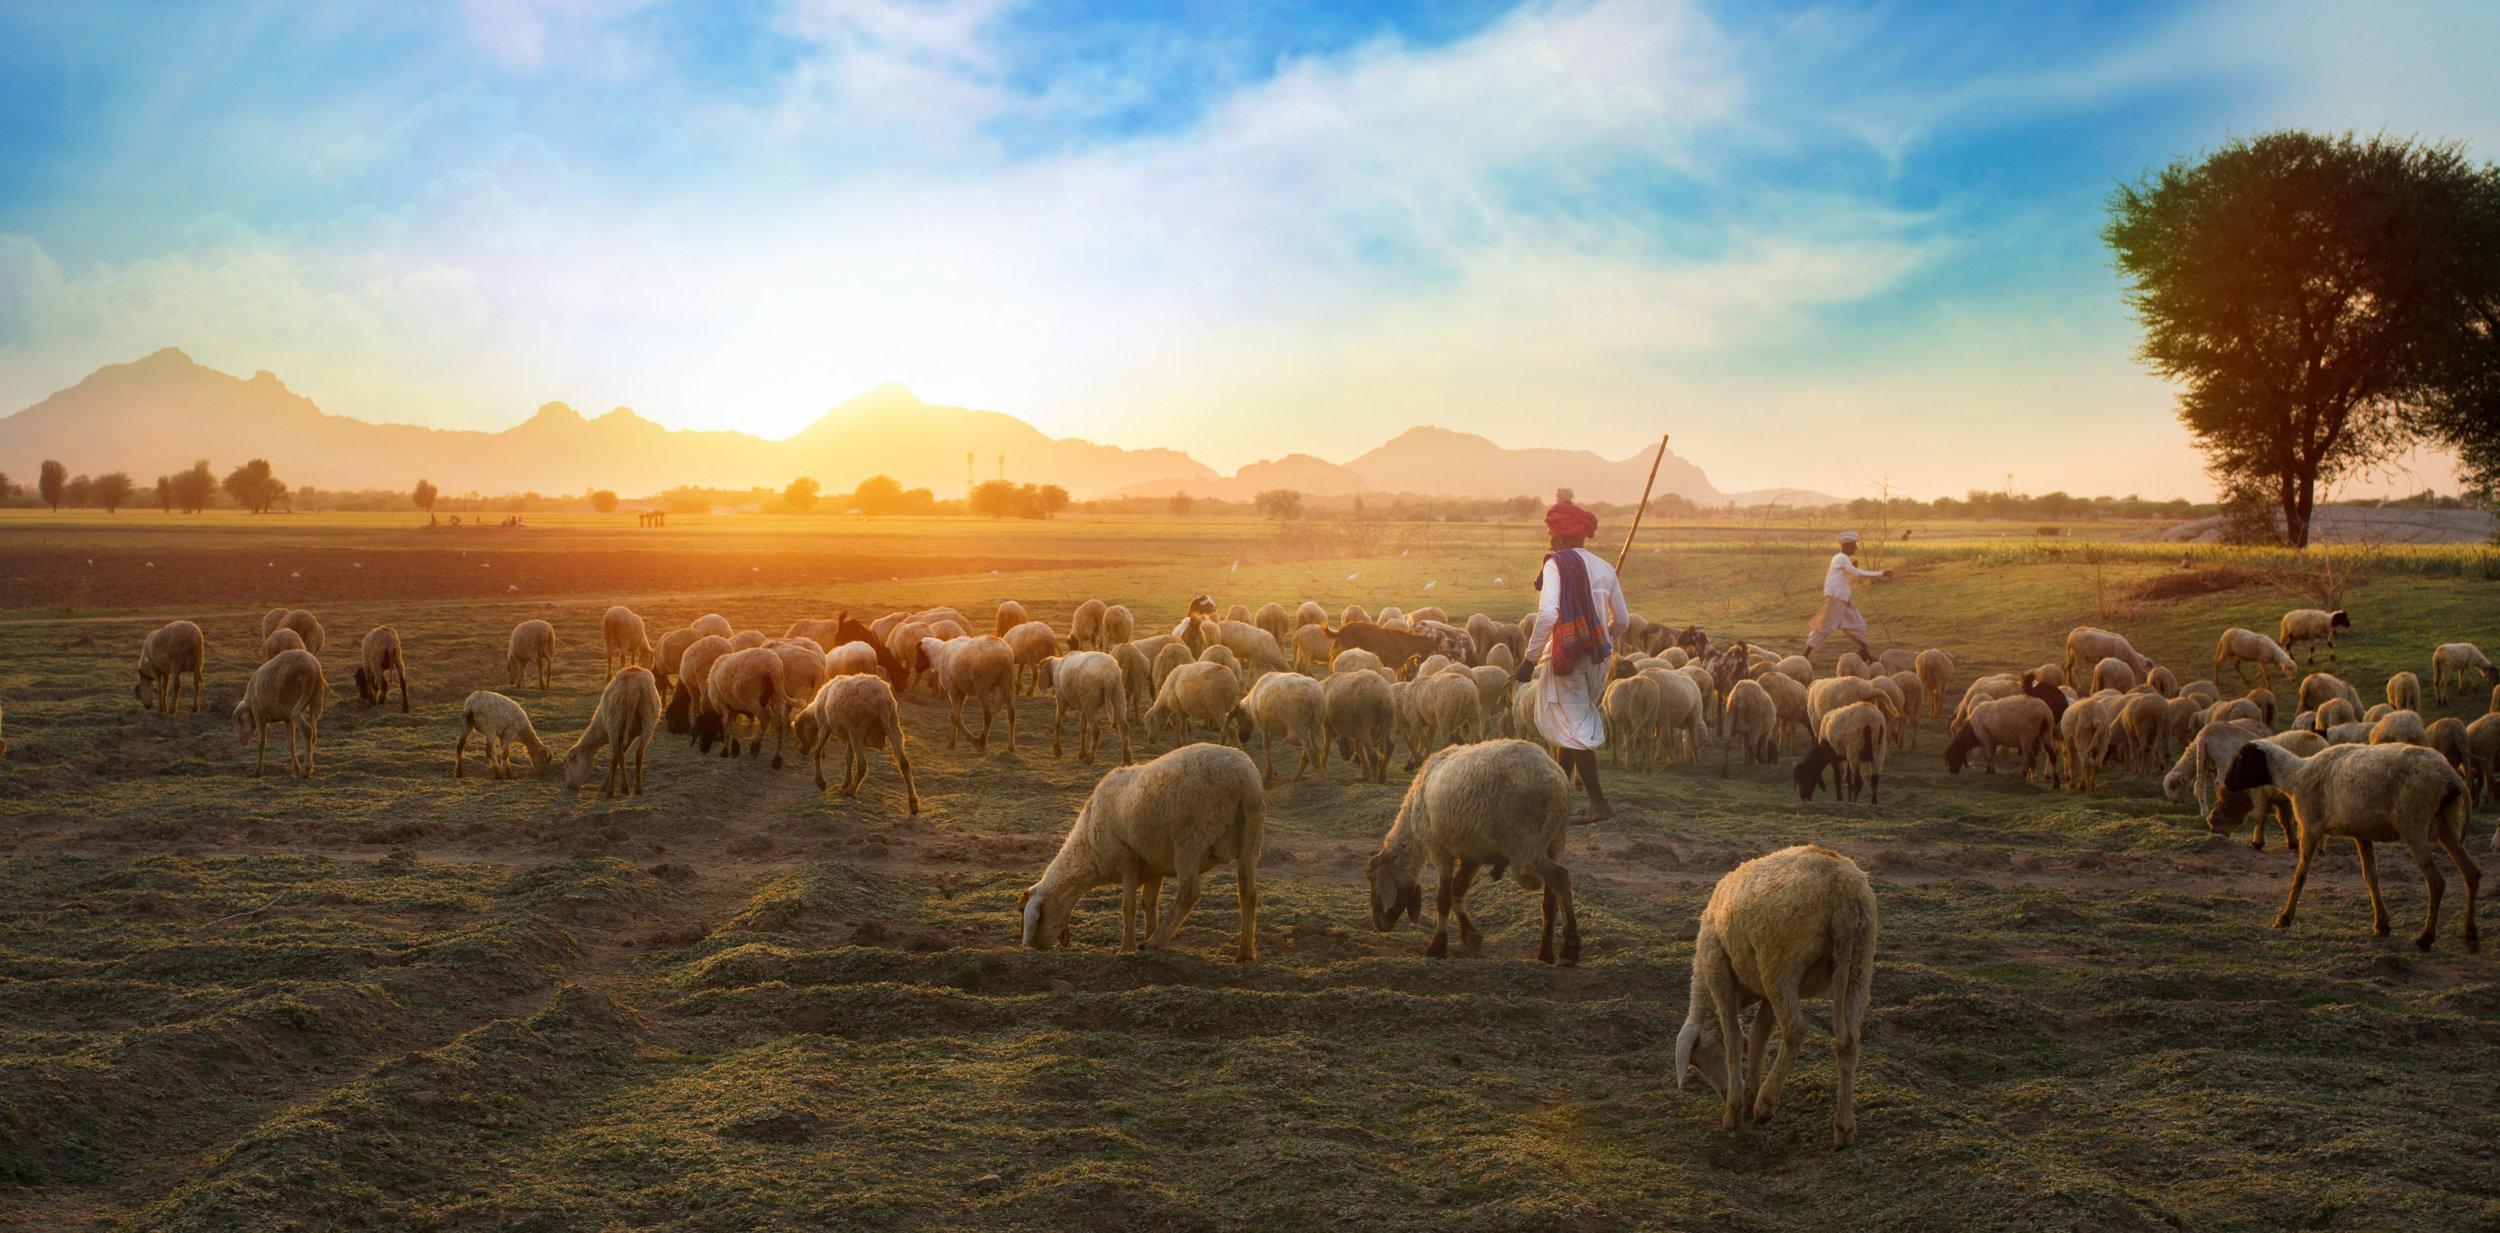 3 farmers with goats.jpeg